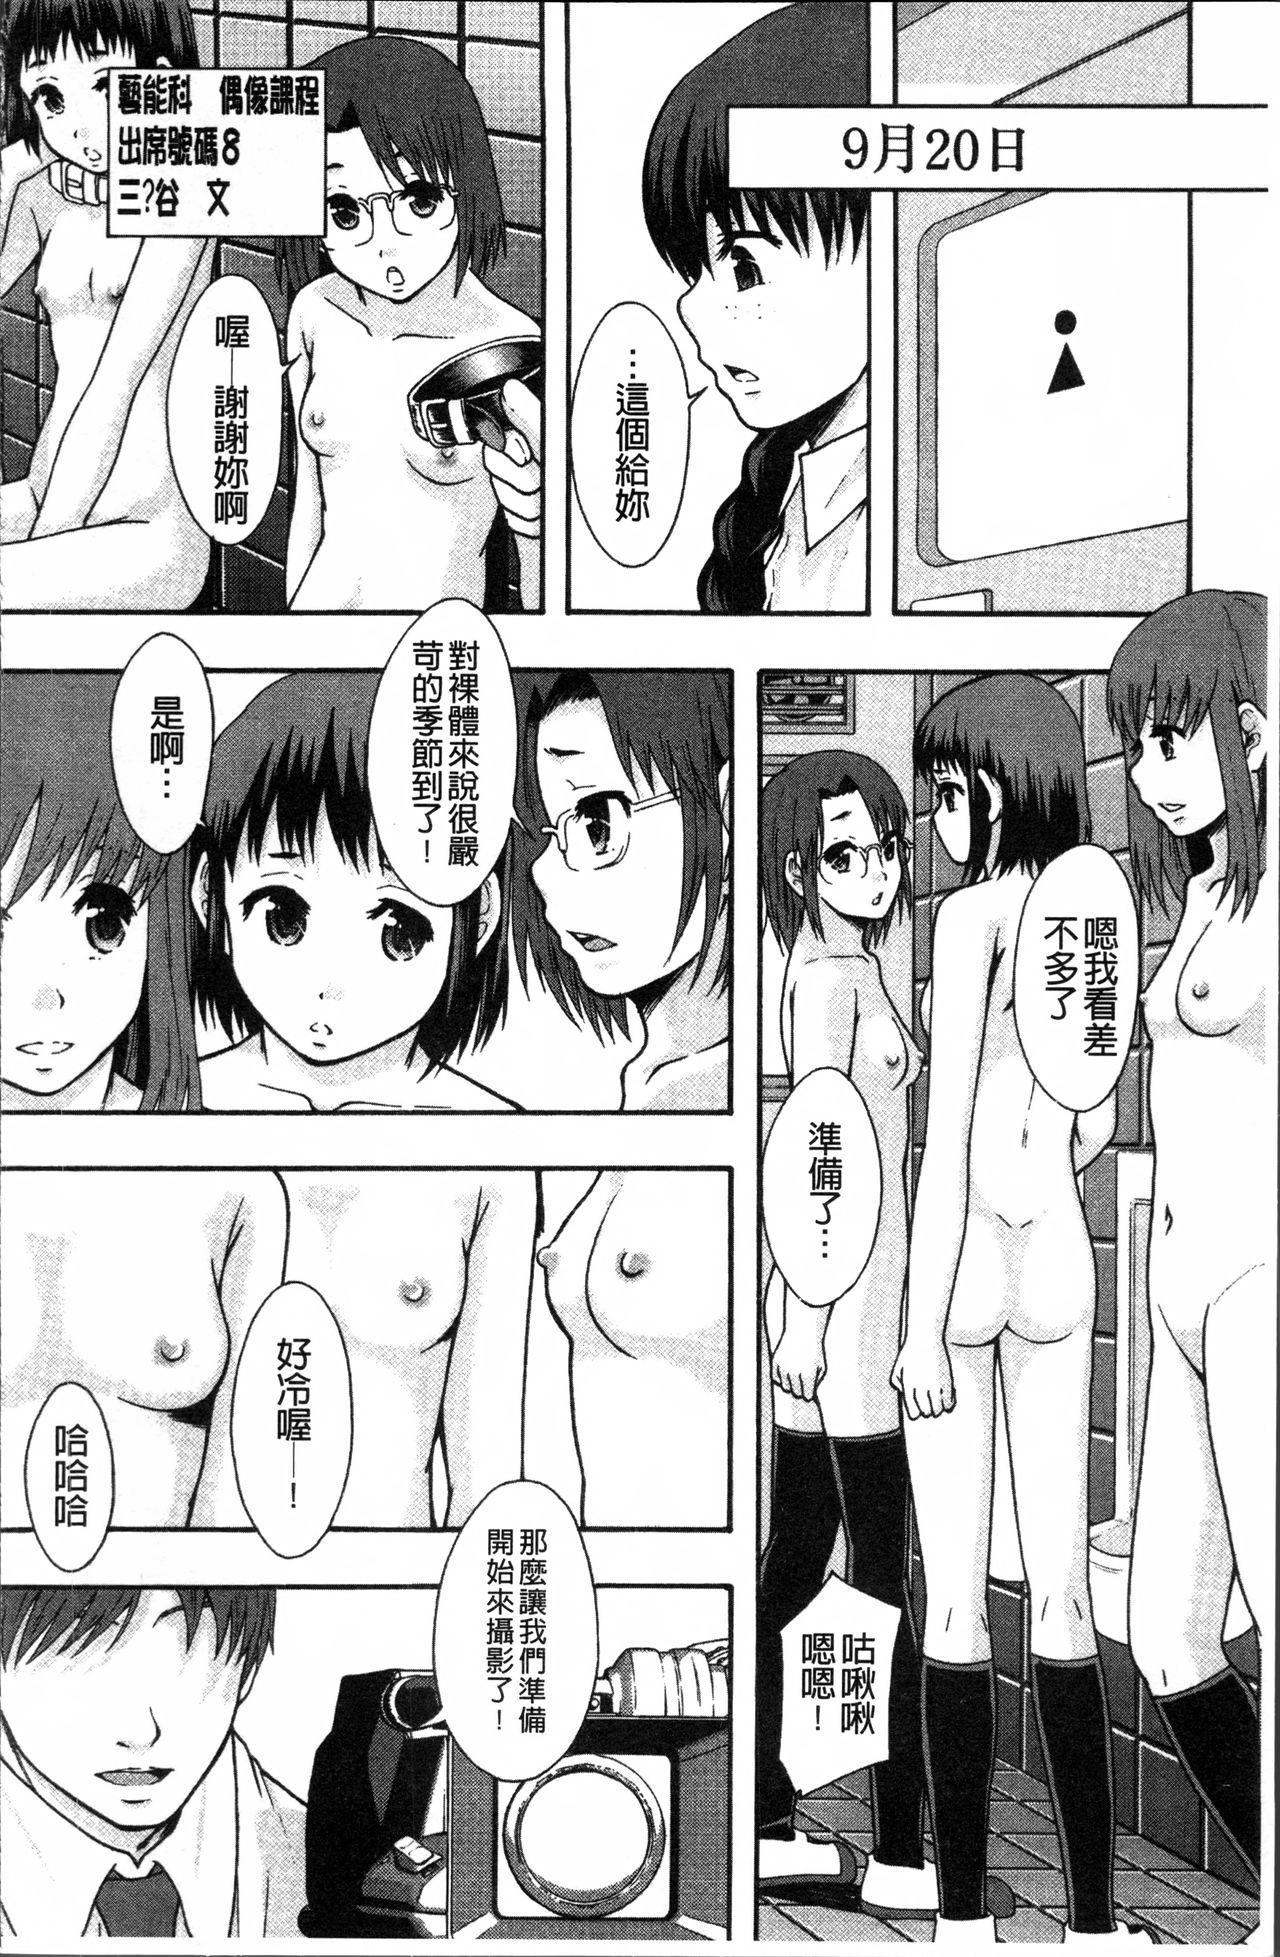 Anoko no Class wa AV-ka 112